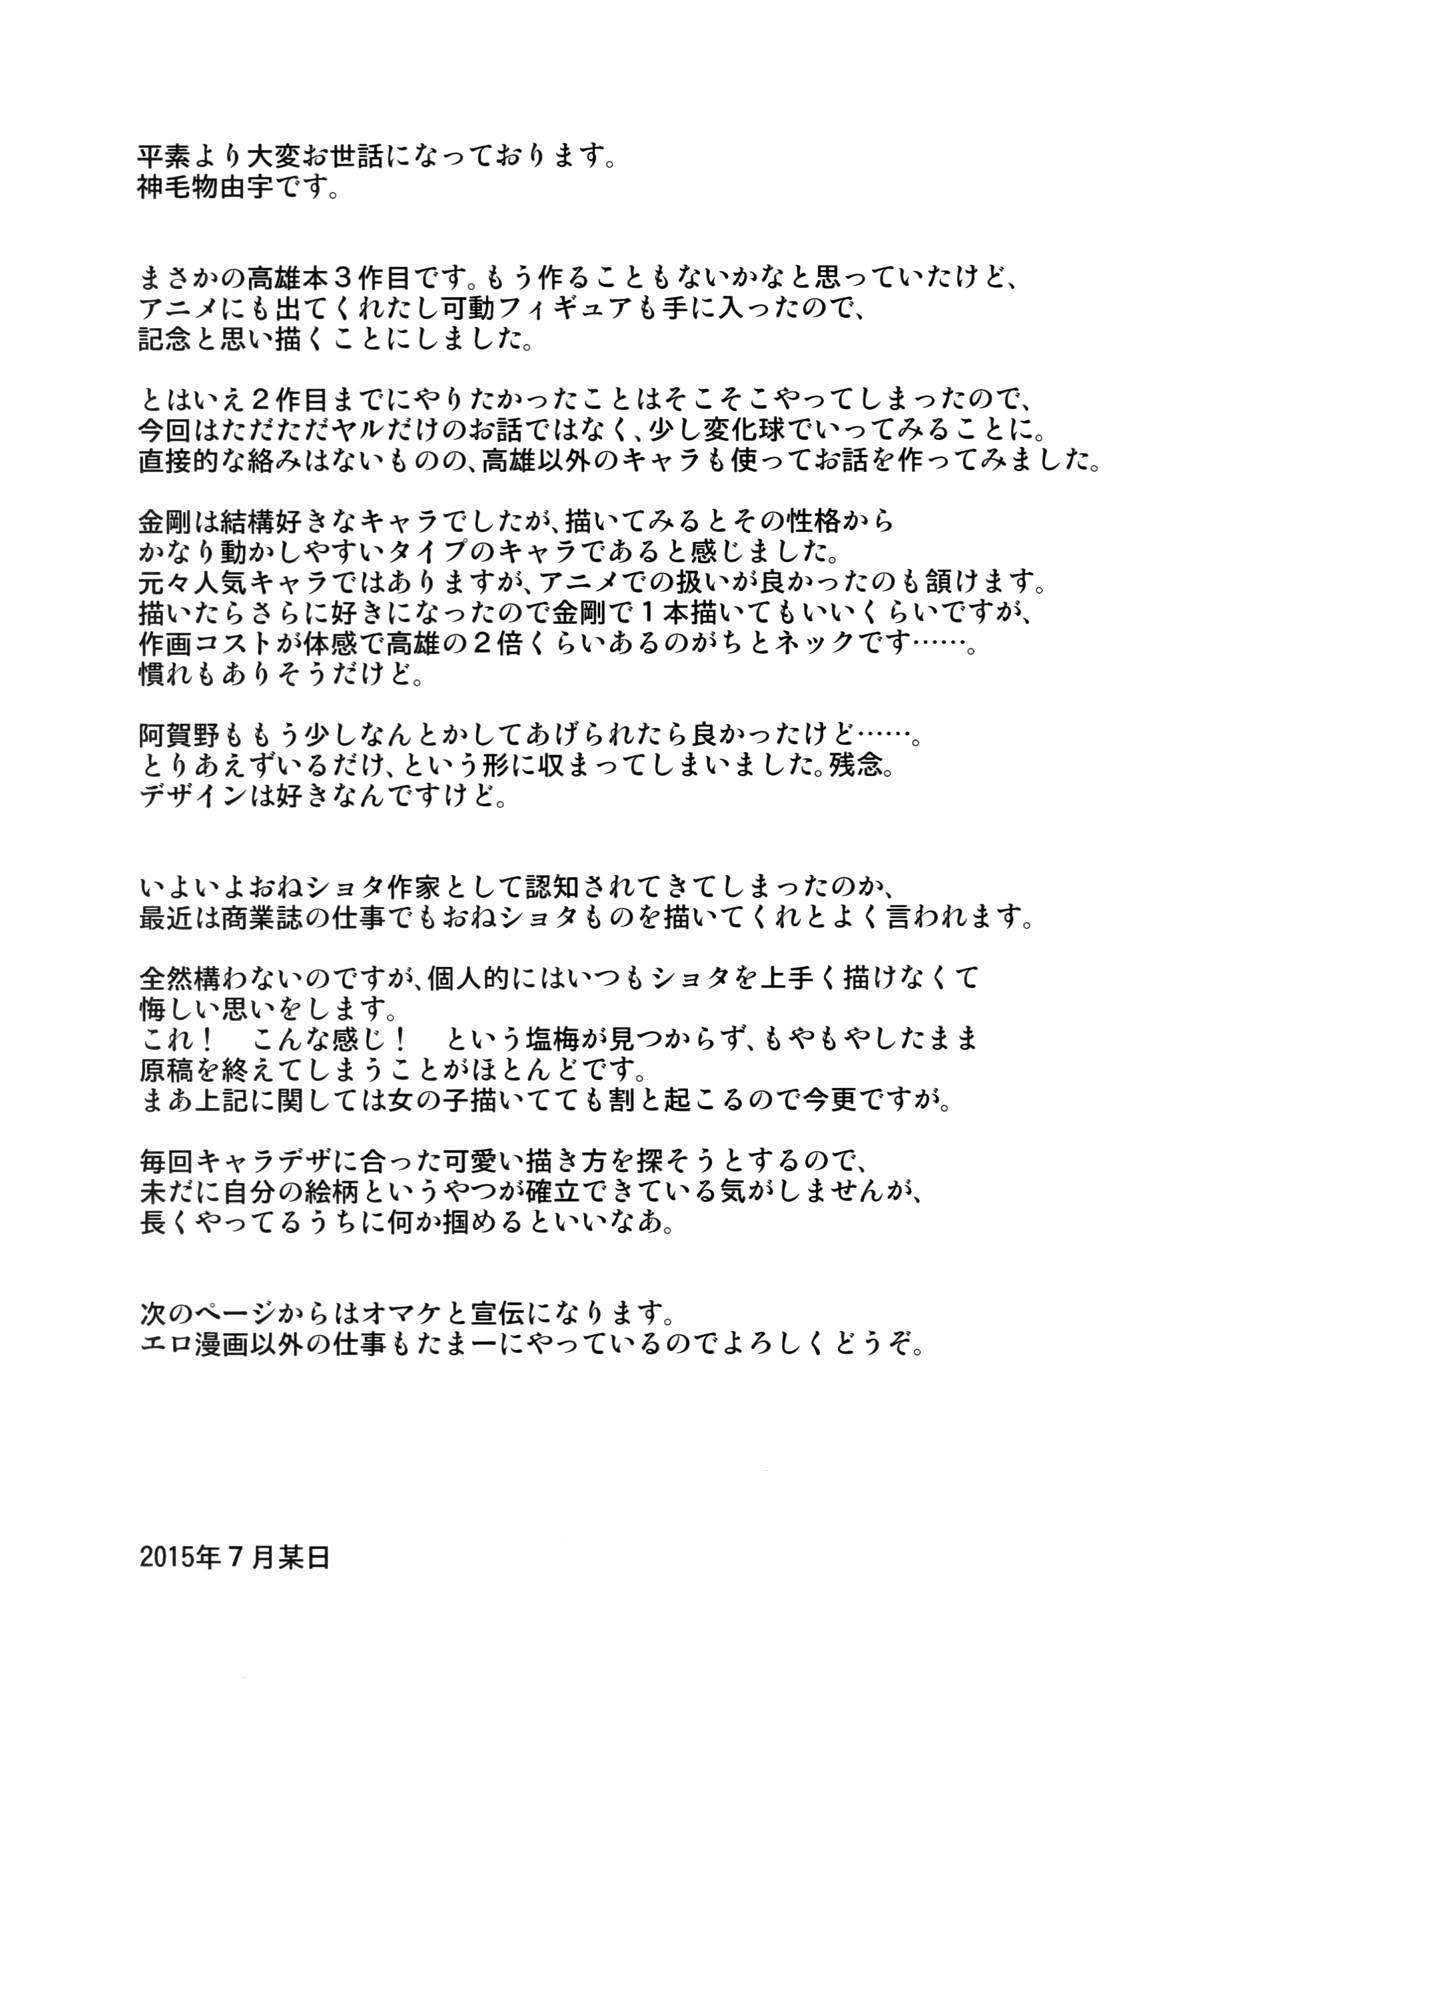 Takao Onee-san to Nyuukyo! Kai Ni Chapter-1 - 18